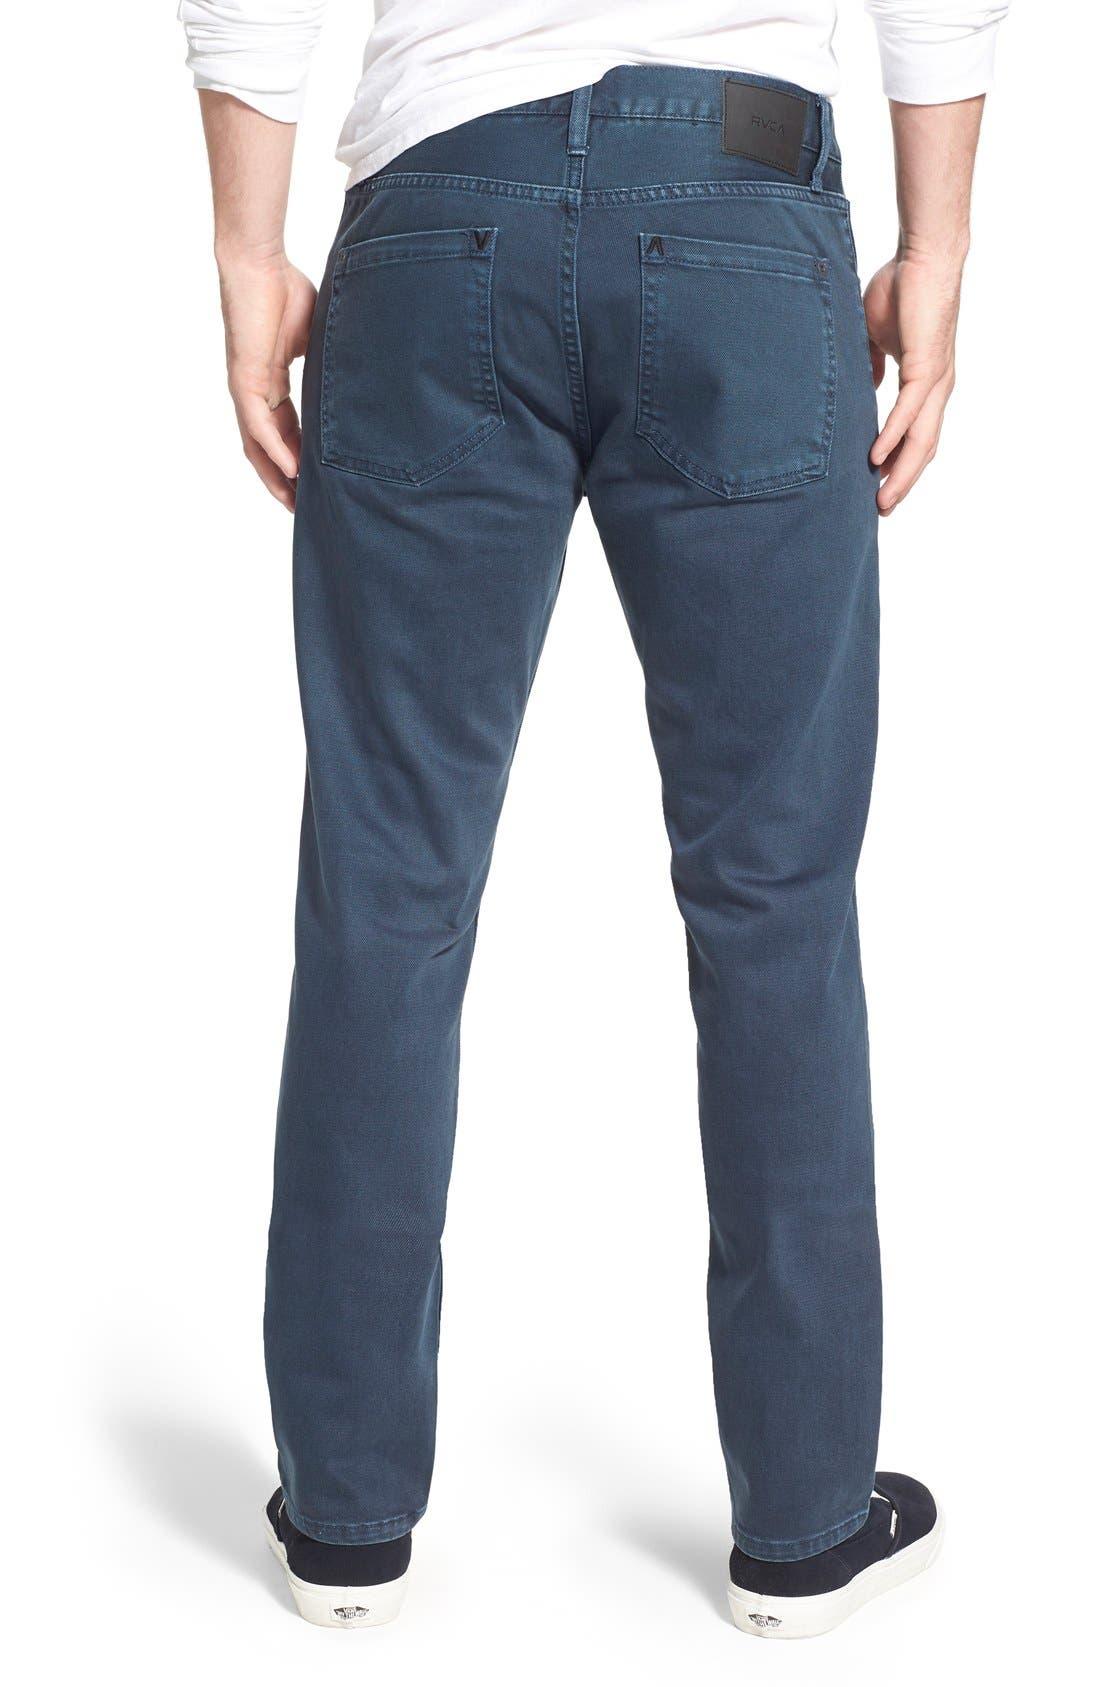 Alternate Image 2  - RVCA 'Daggers' Slim Fit Jeans (Army Drab)